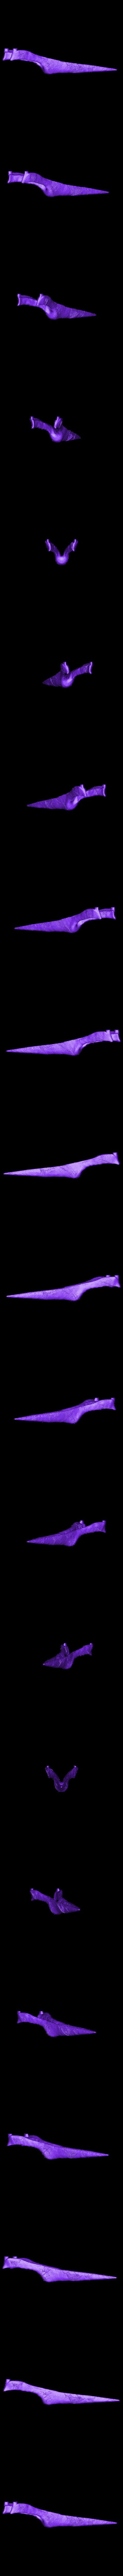 PteranodonJaw.stl Download free STL file Flying Dinosaur Skull • 3D printer model, LordLilapause